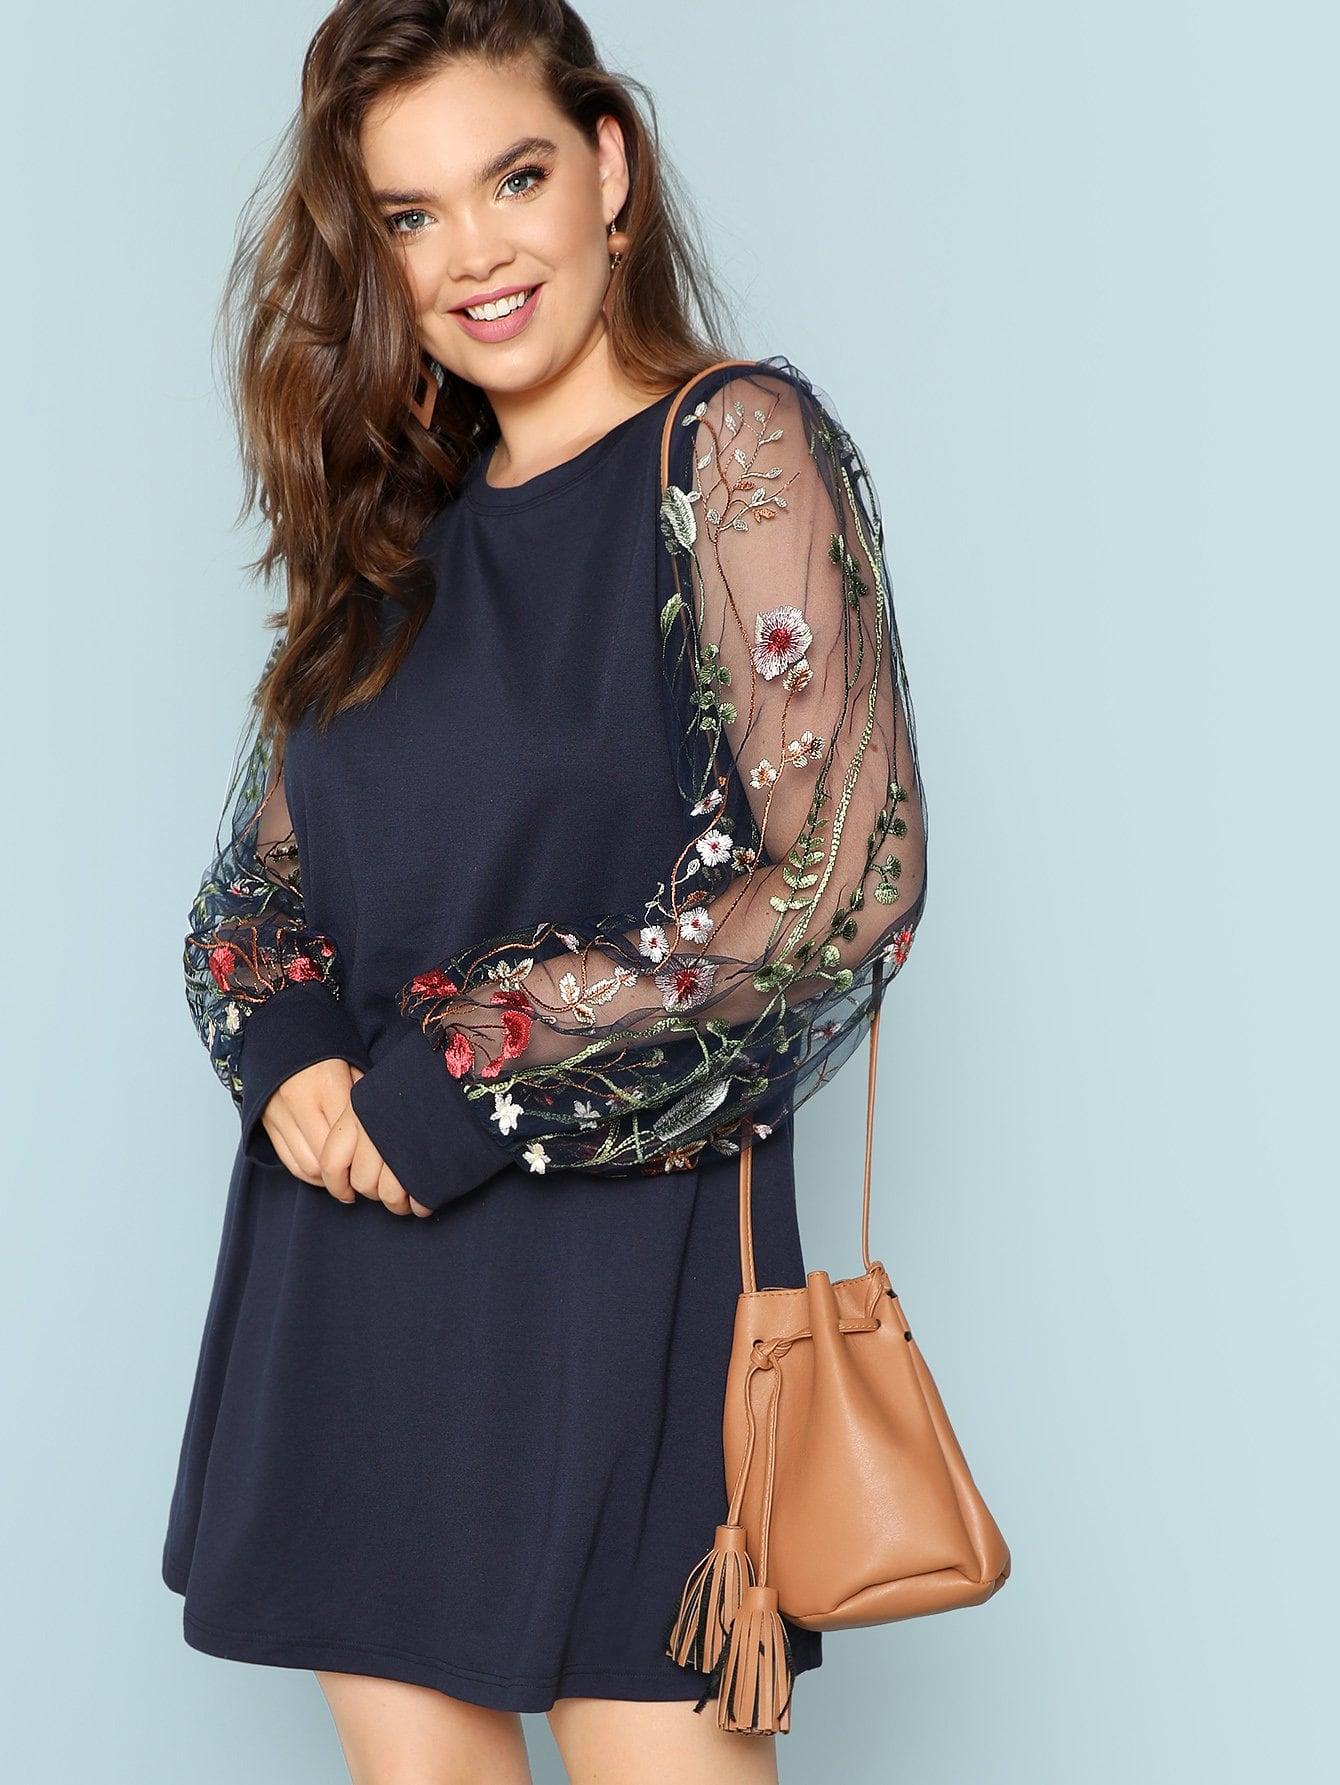 Купить Контраст Цветочная вышивка Mesh Sleeve Longline Толстовка, Bree Kish, SheIn